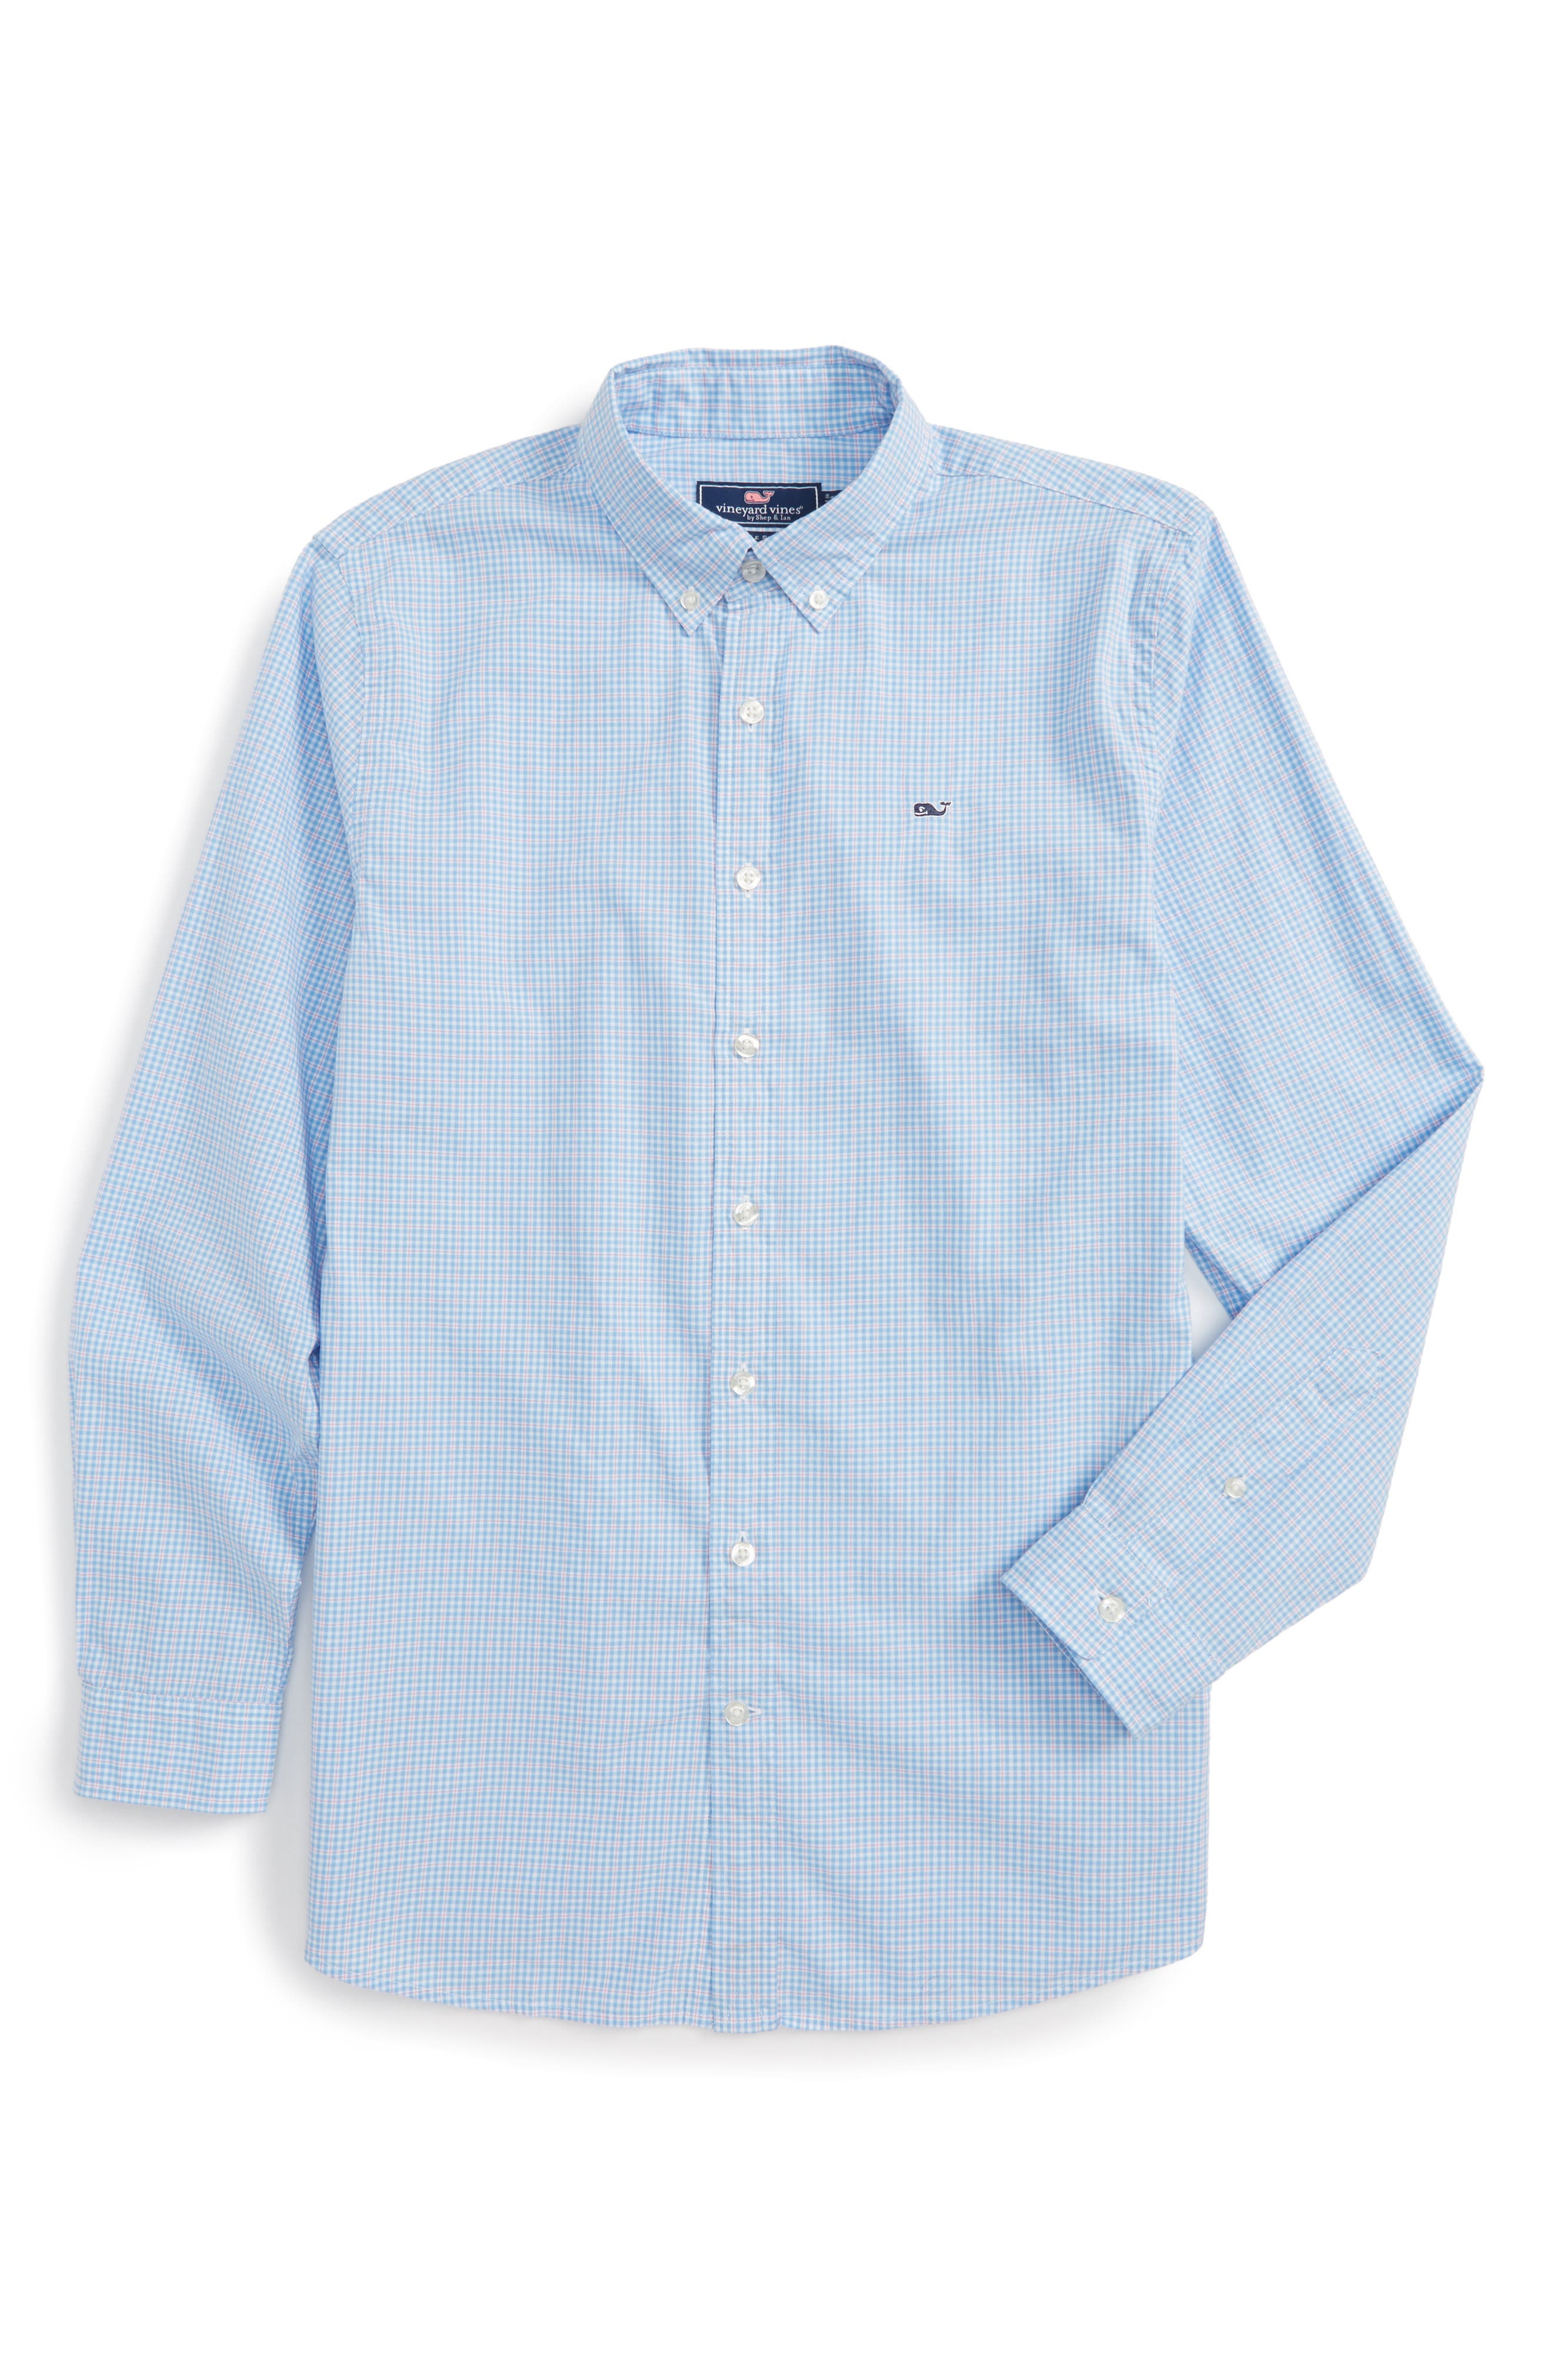 Vineyard Vines Stowaway Plaid Shirt (Big Boys)